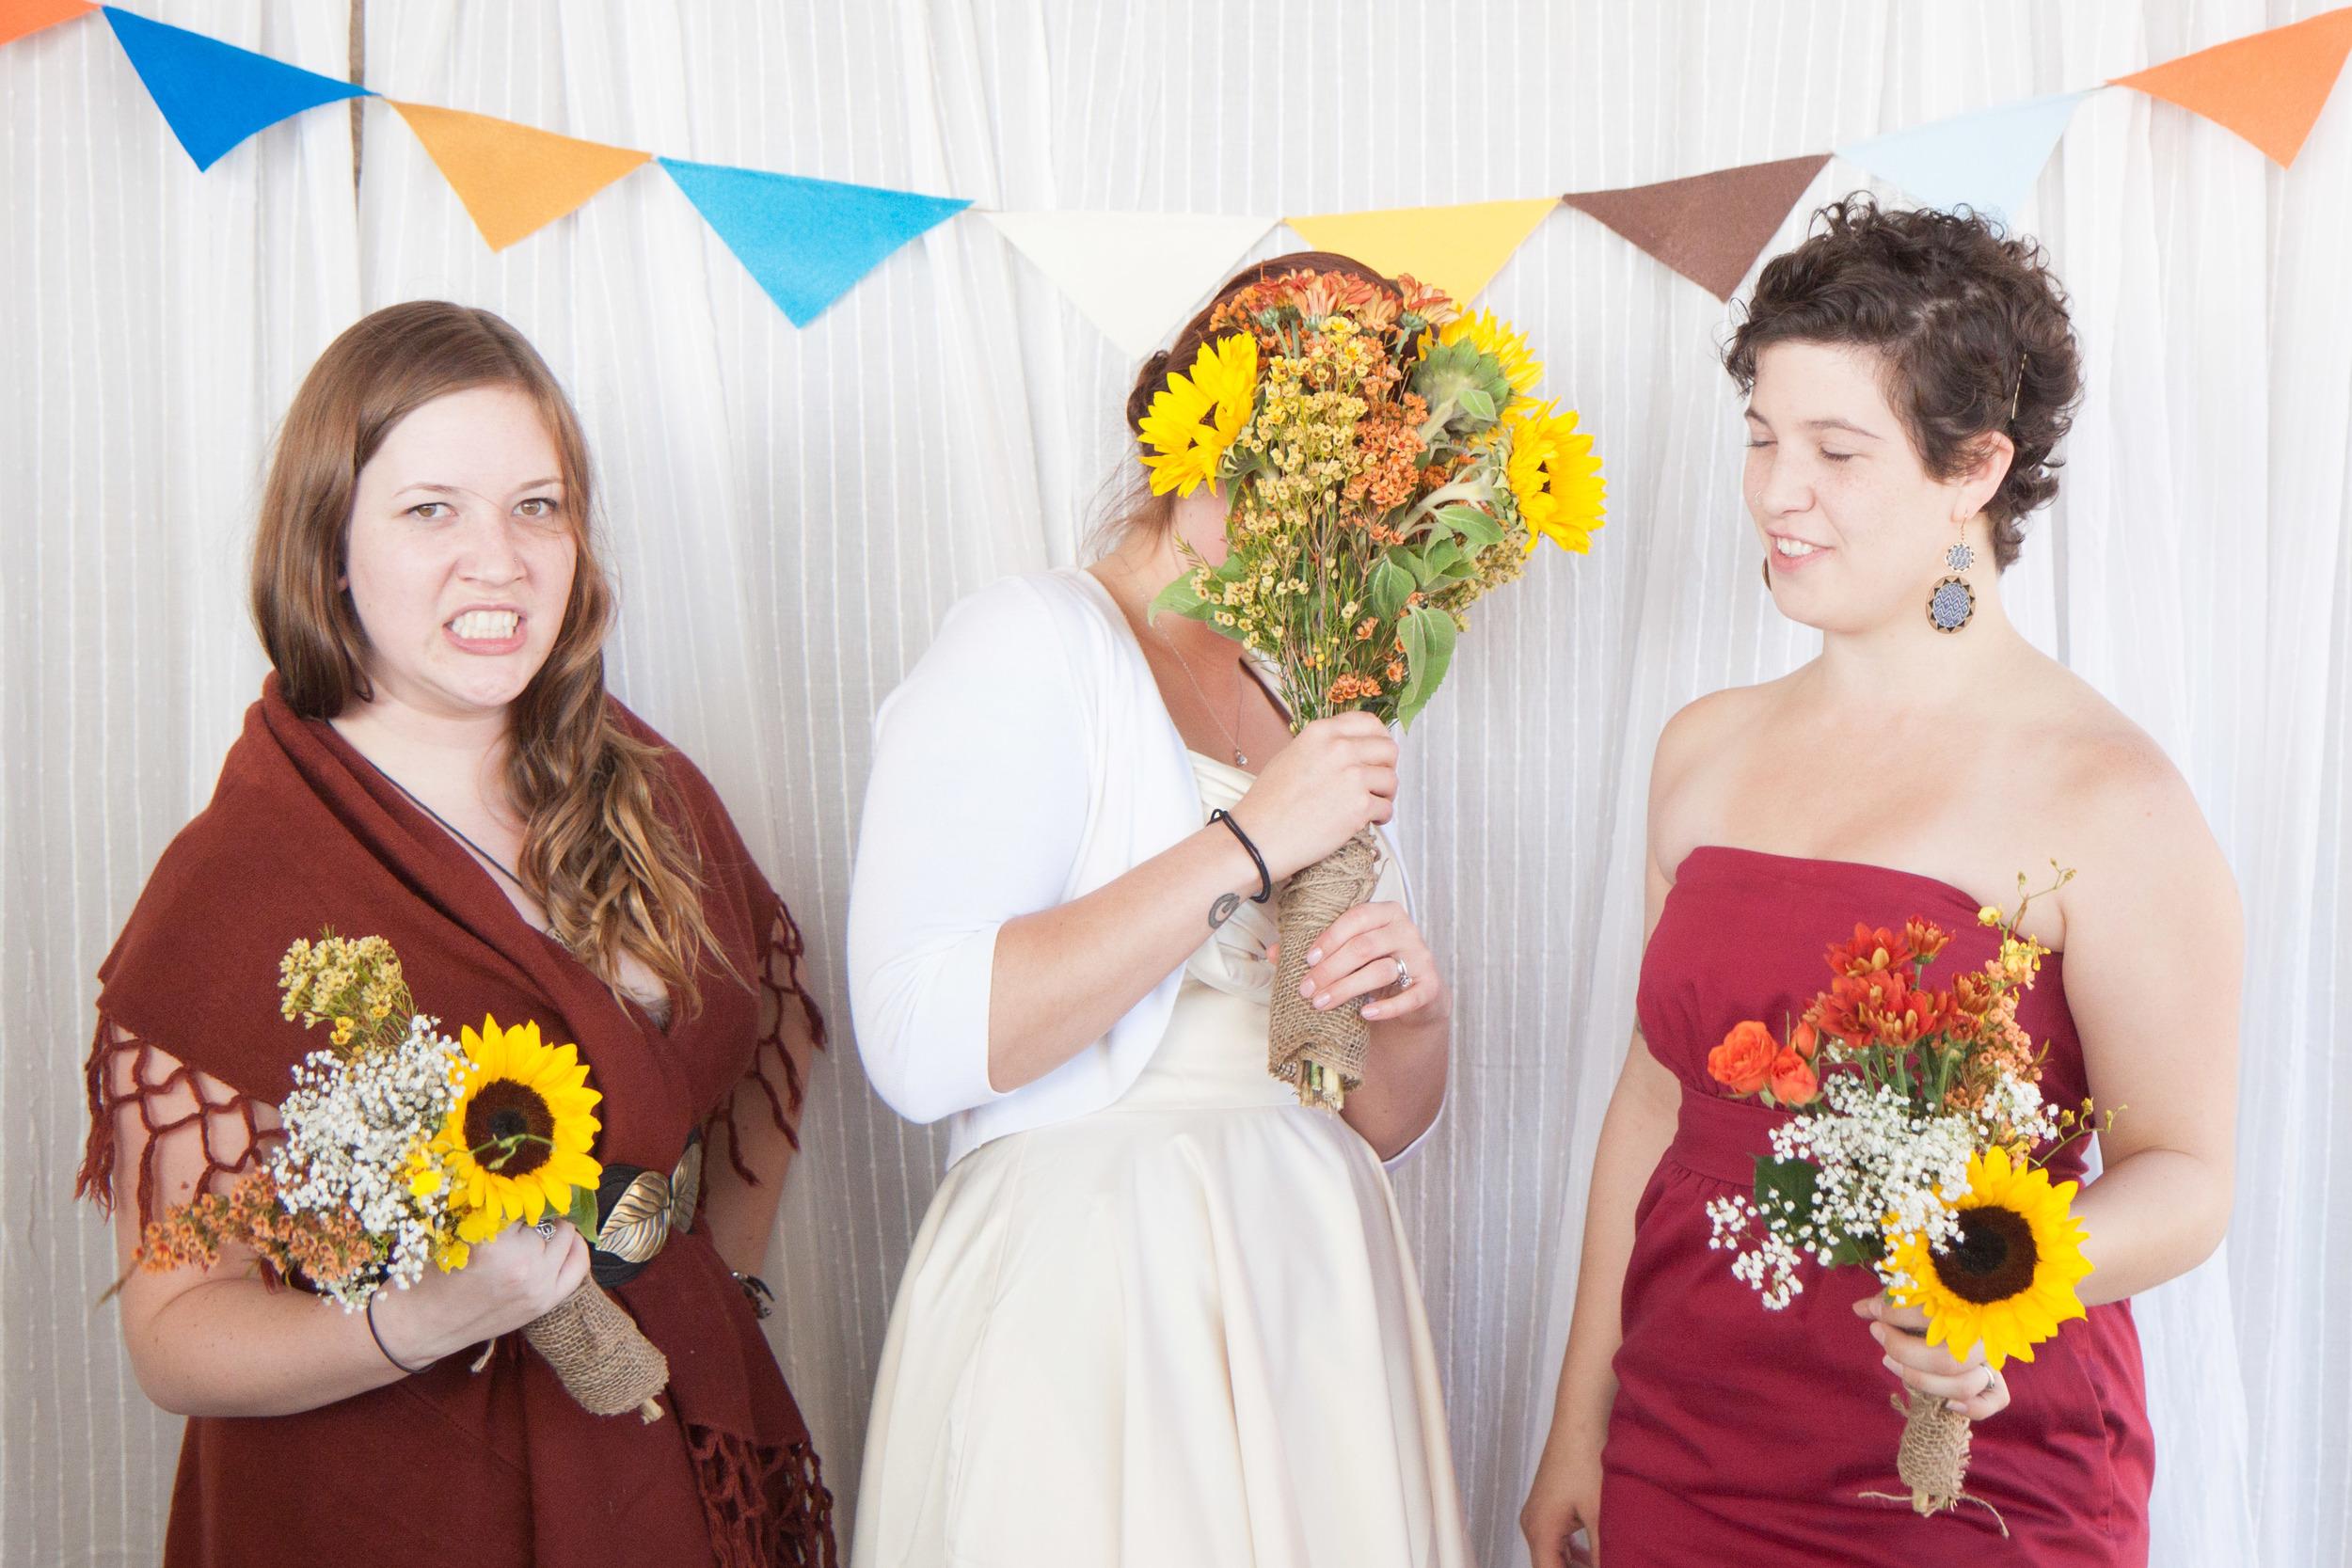 Wilson Bickel Wedding - Family Photos (12 of 25).jpg